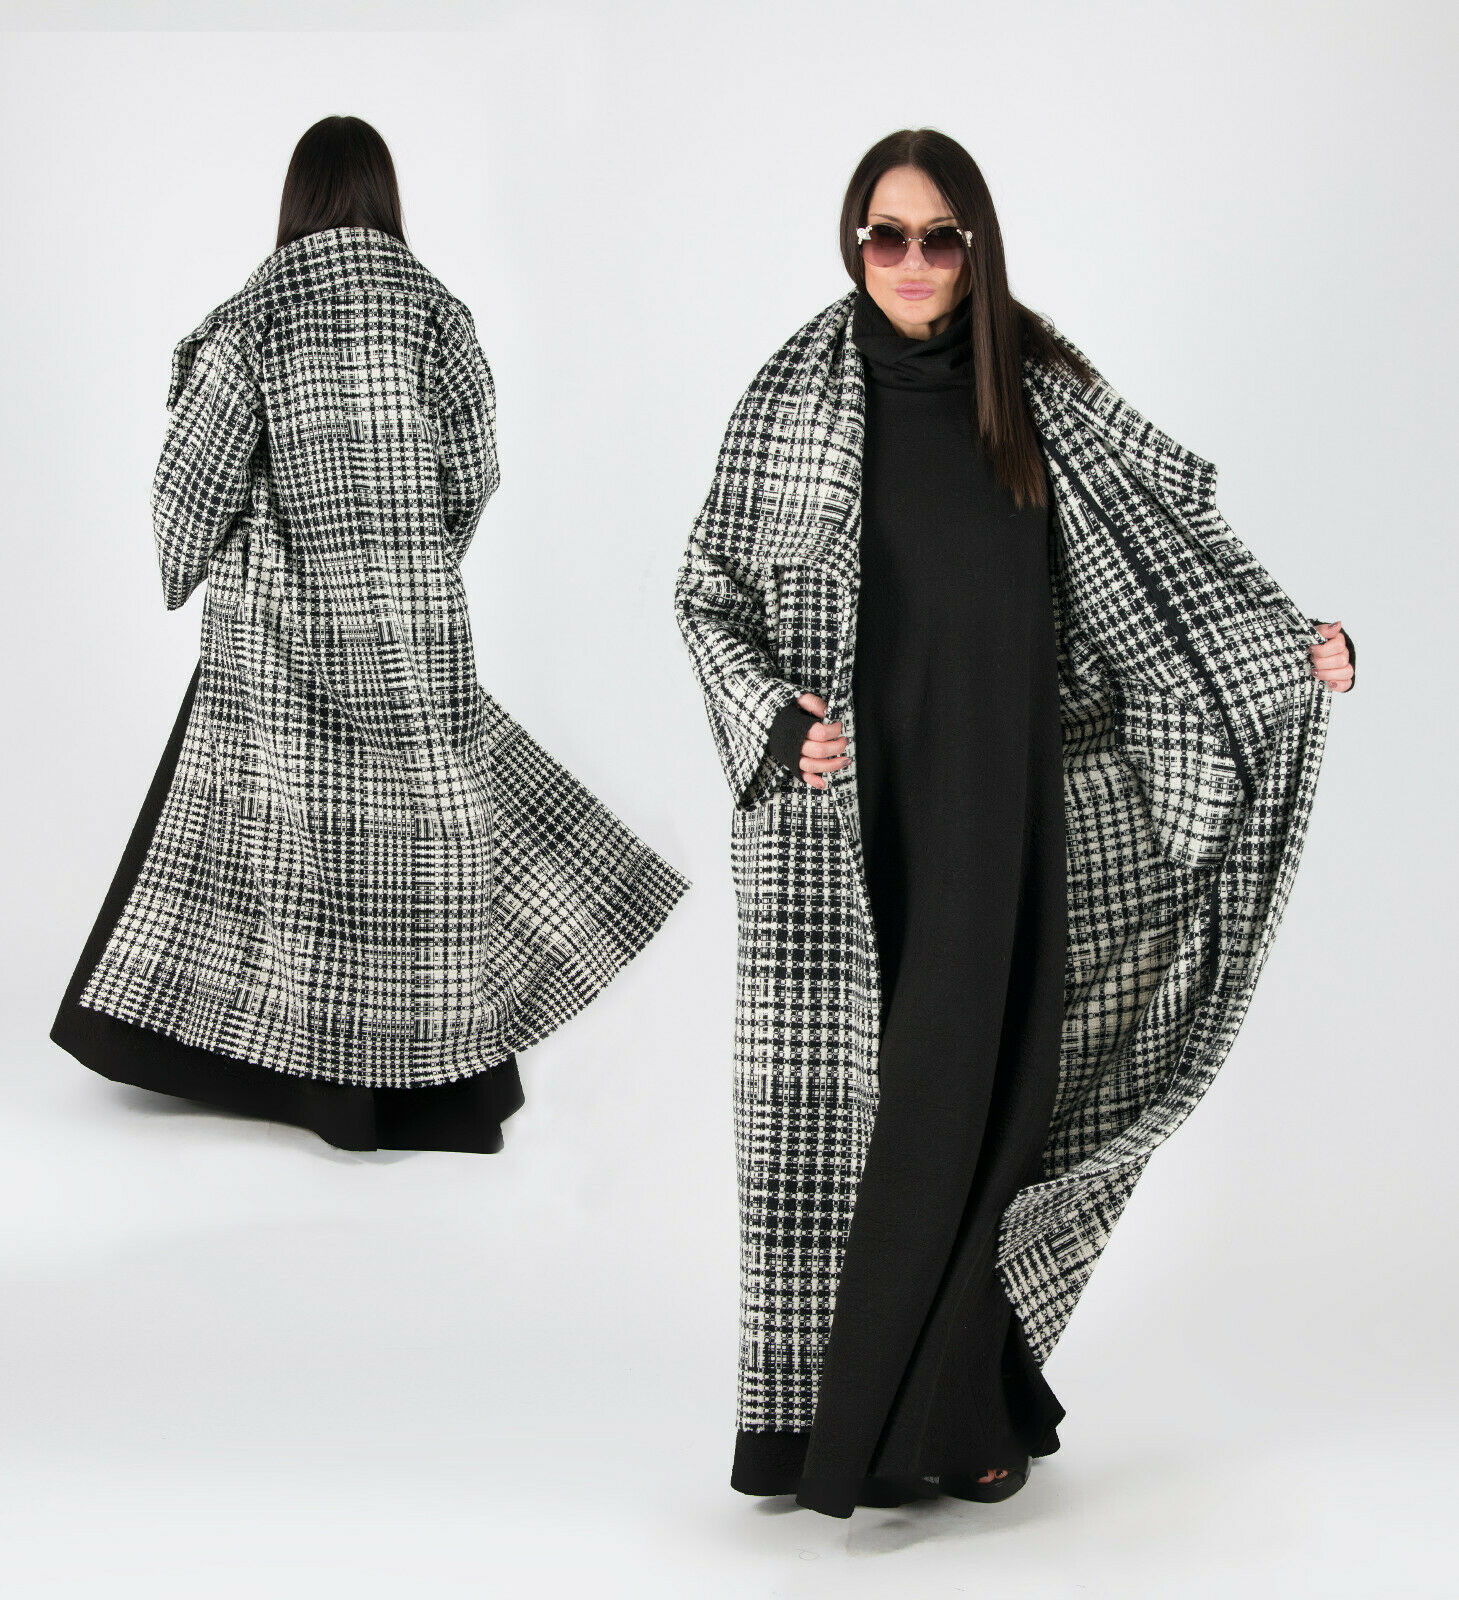 Winter Coat, Wool Coat, Plus Size Clothing, Long Coat, Loose Knit Coat, Warm...